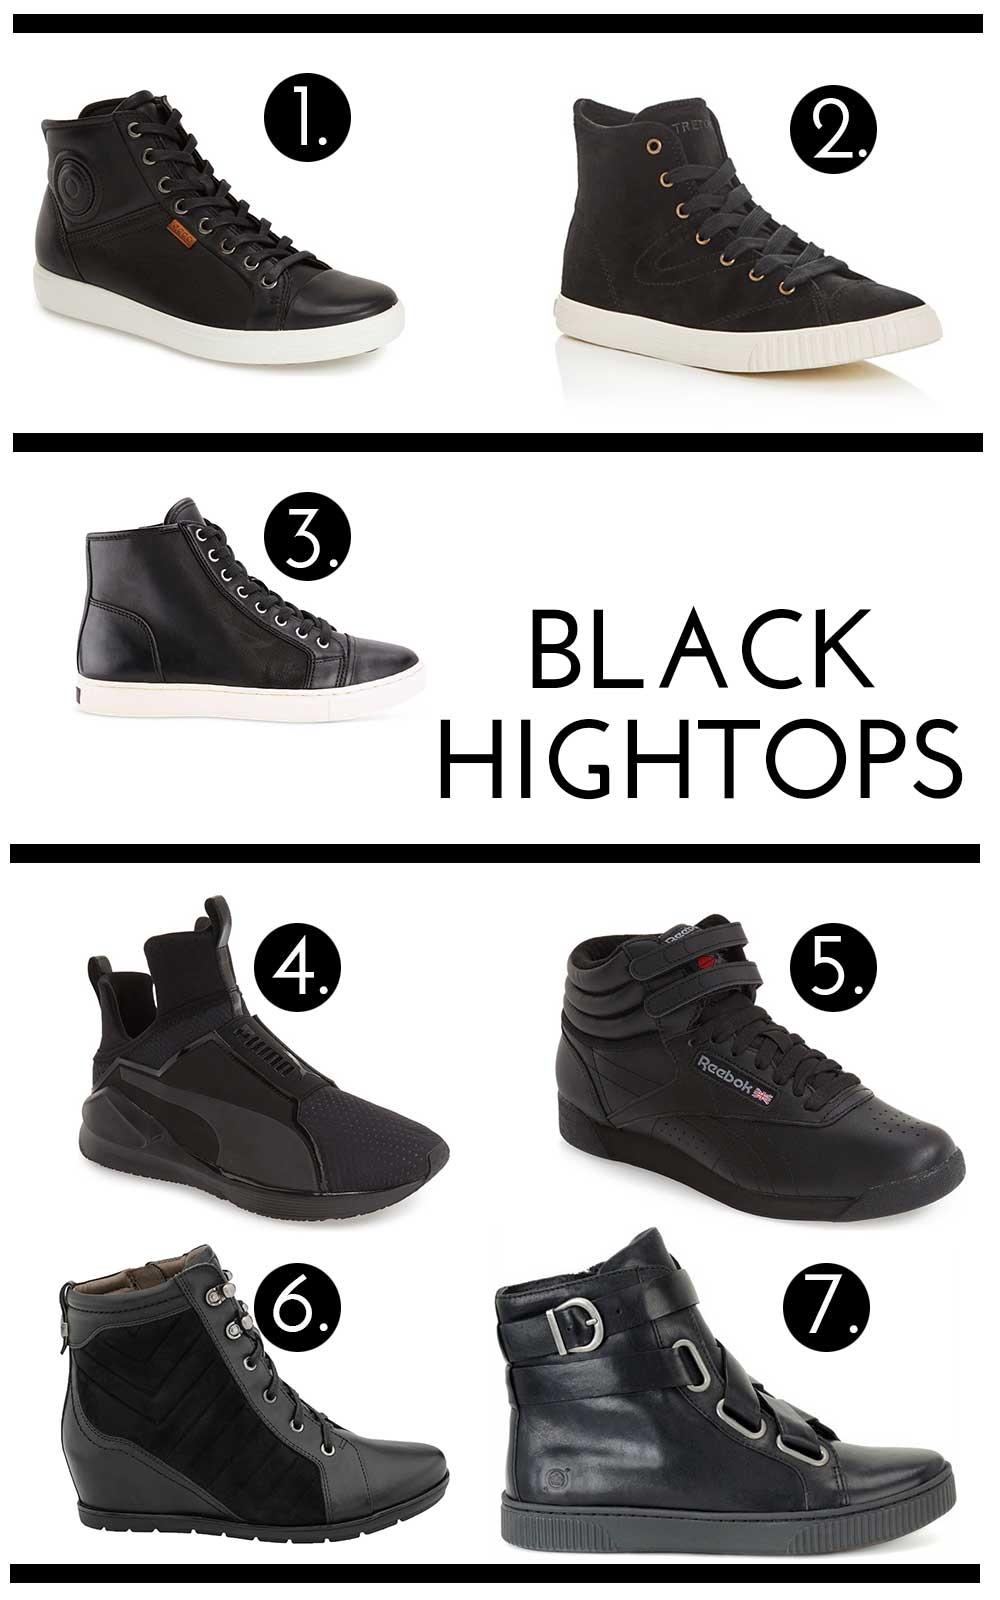 Minimal black high-tops for fall